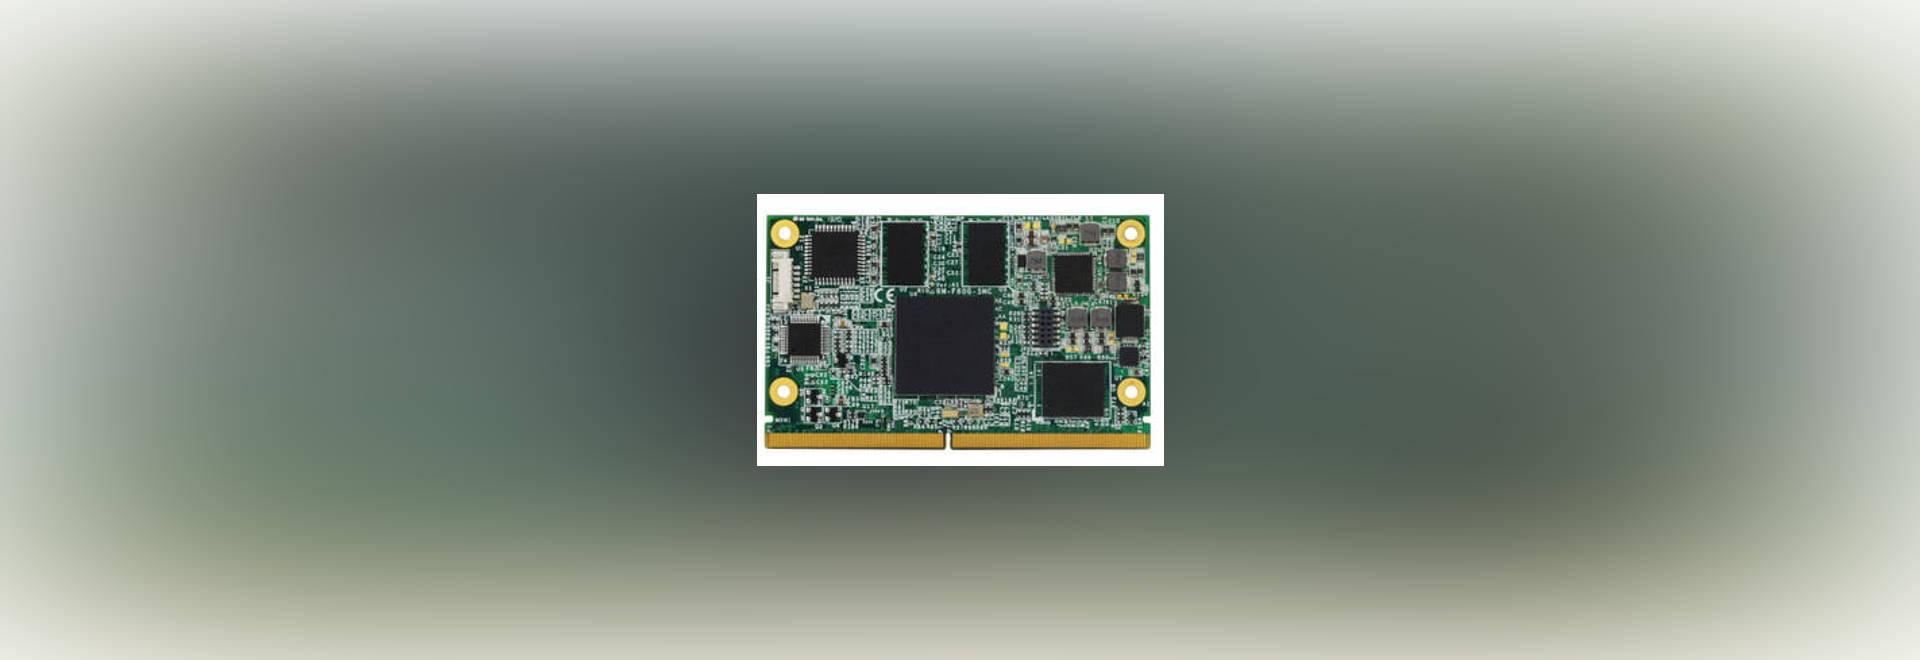 SFF SMARC Module supports ARM Cortex A9 i MX6 processors